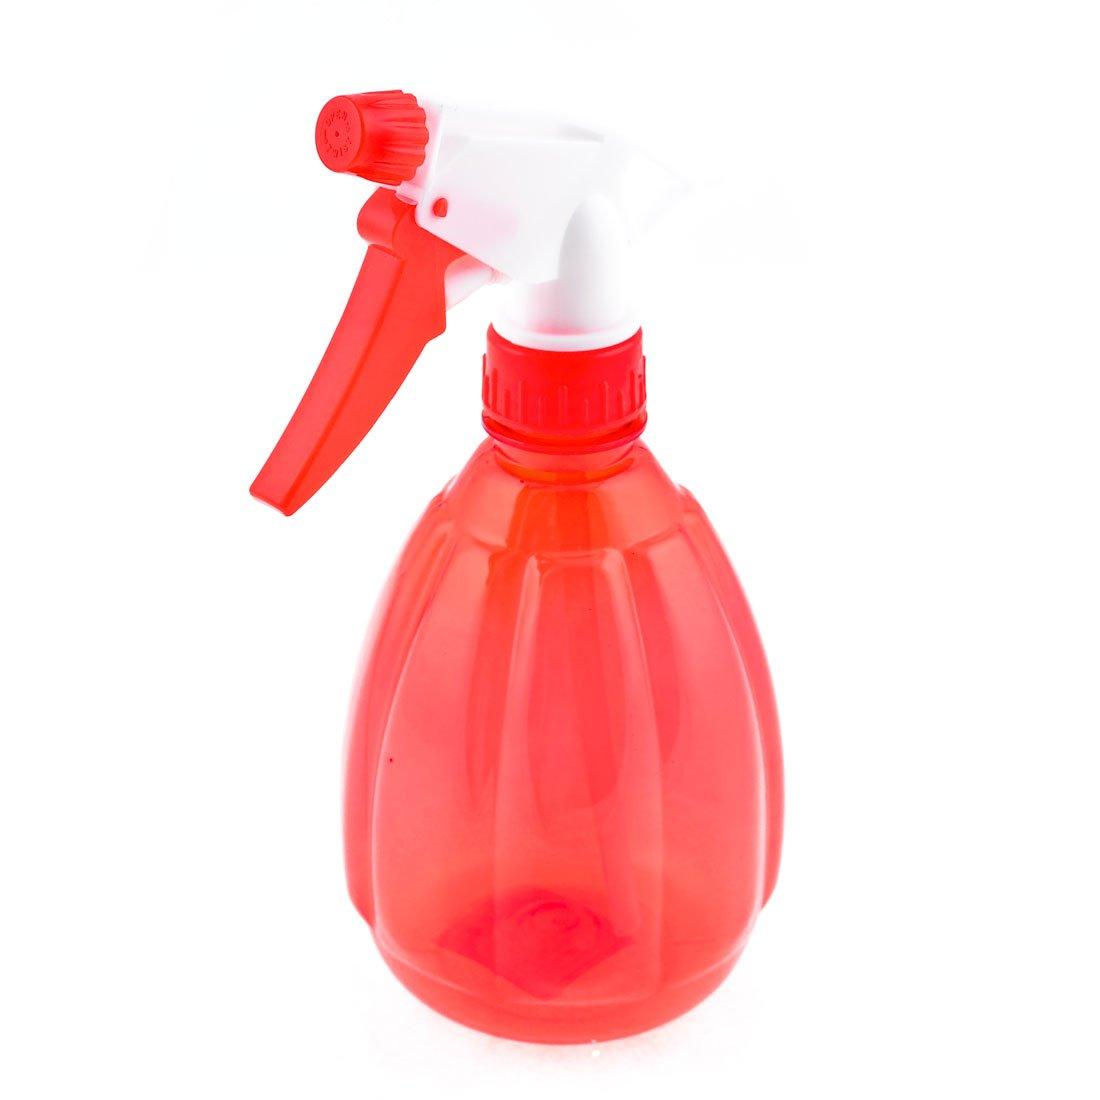 SODIAL(R) Clear Red Plastic Trigger Spray Bottle Flower Plant Water Sprayer 500ml